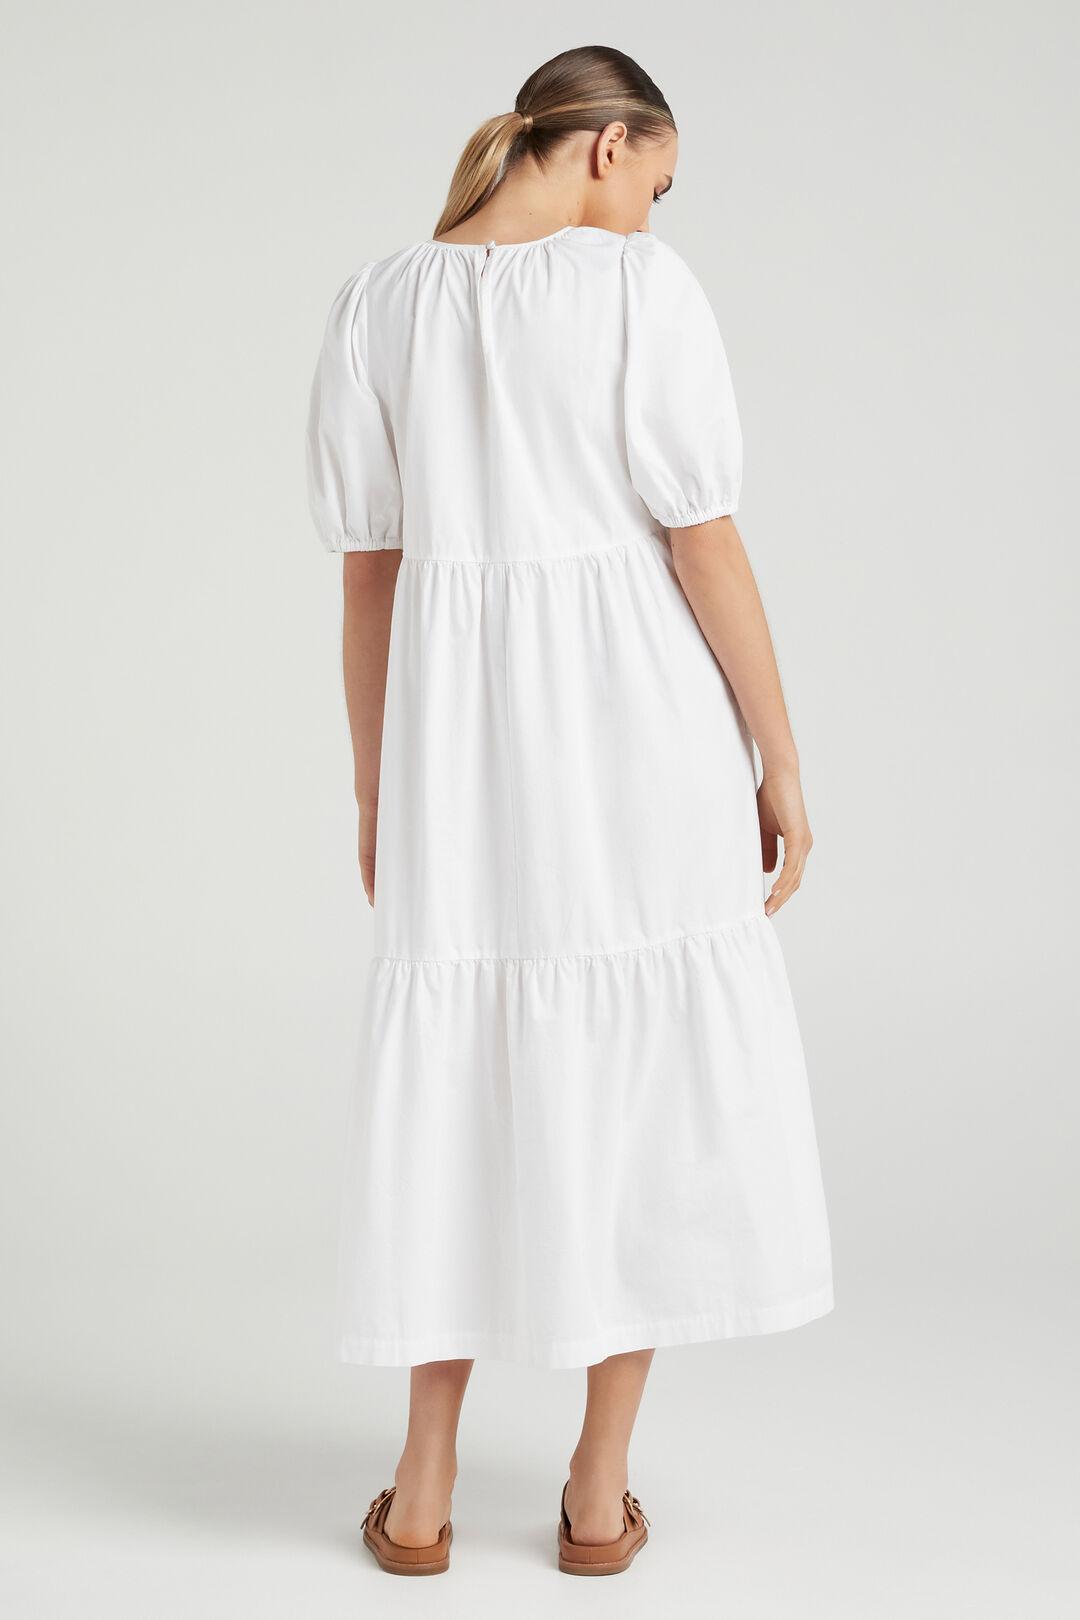 COTTON TIERED DRESS  WHITE  hi-res